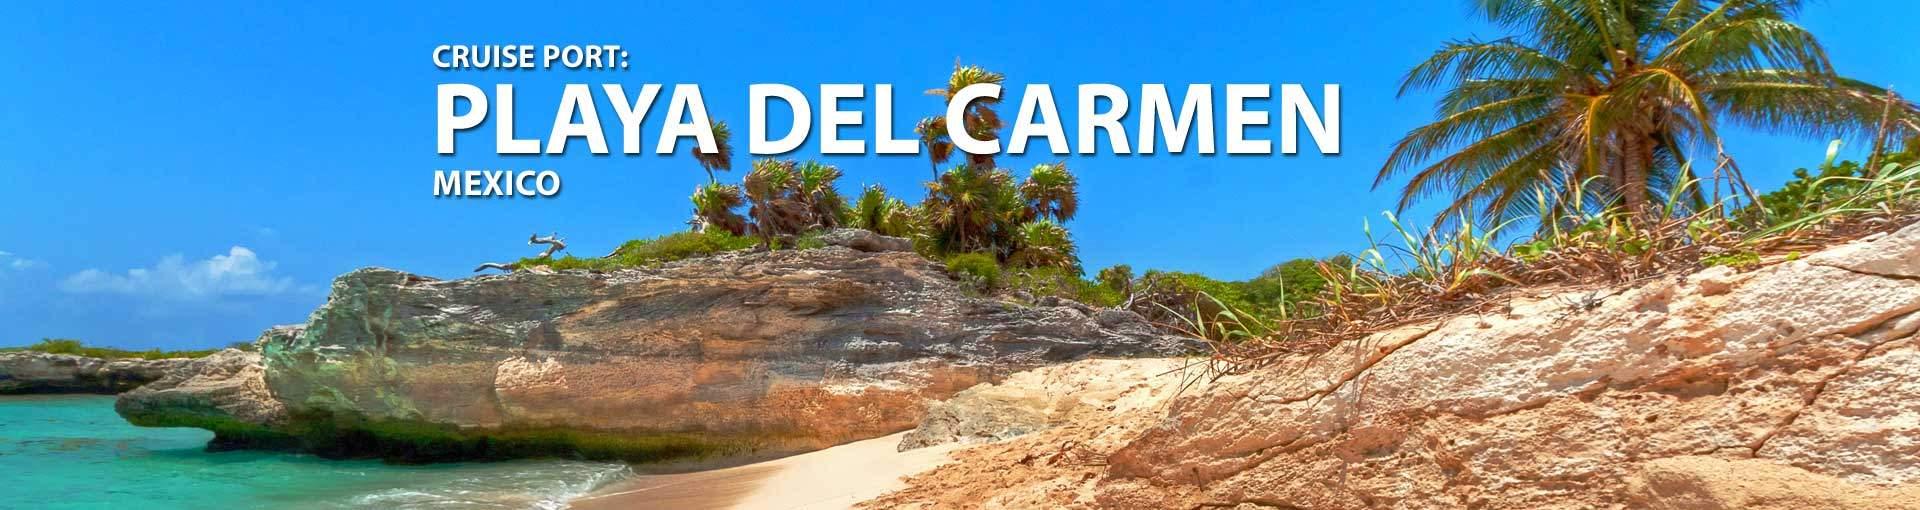 Cruises to Playa Del Carmen, Mexico